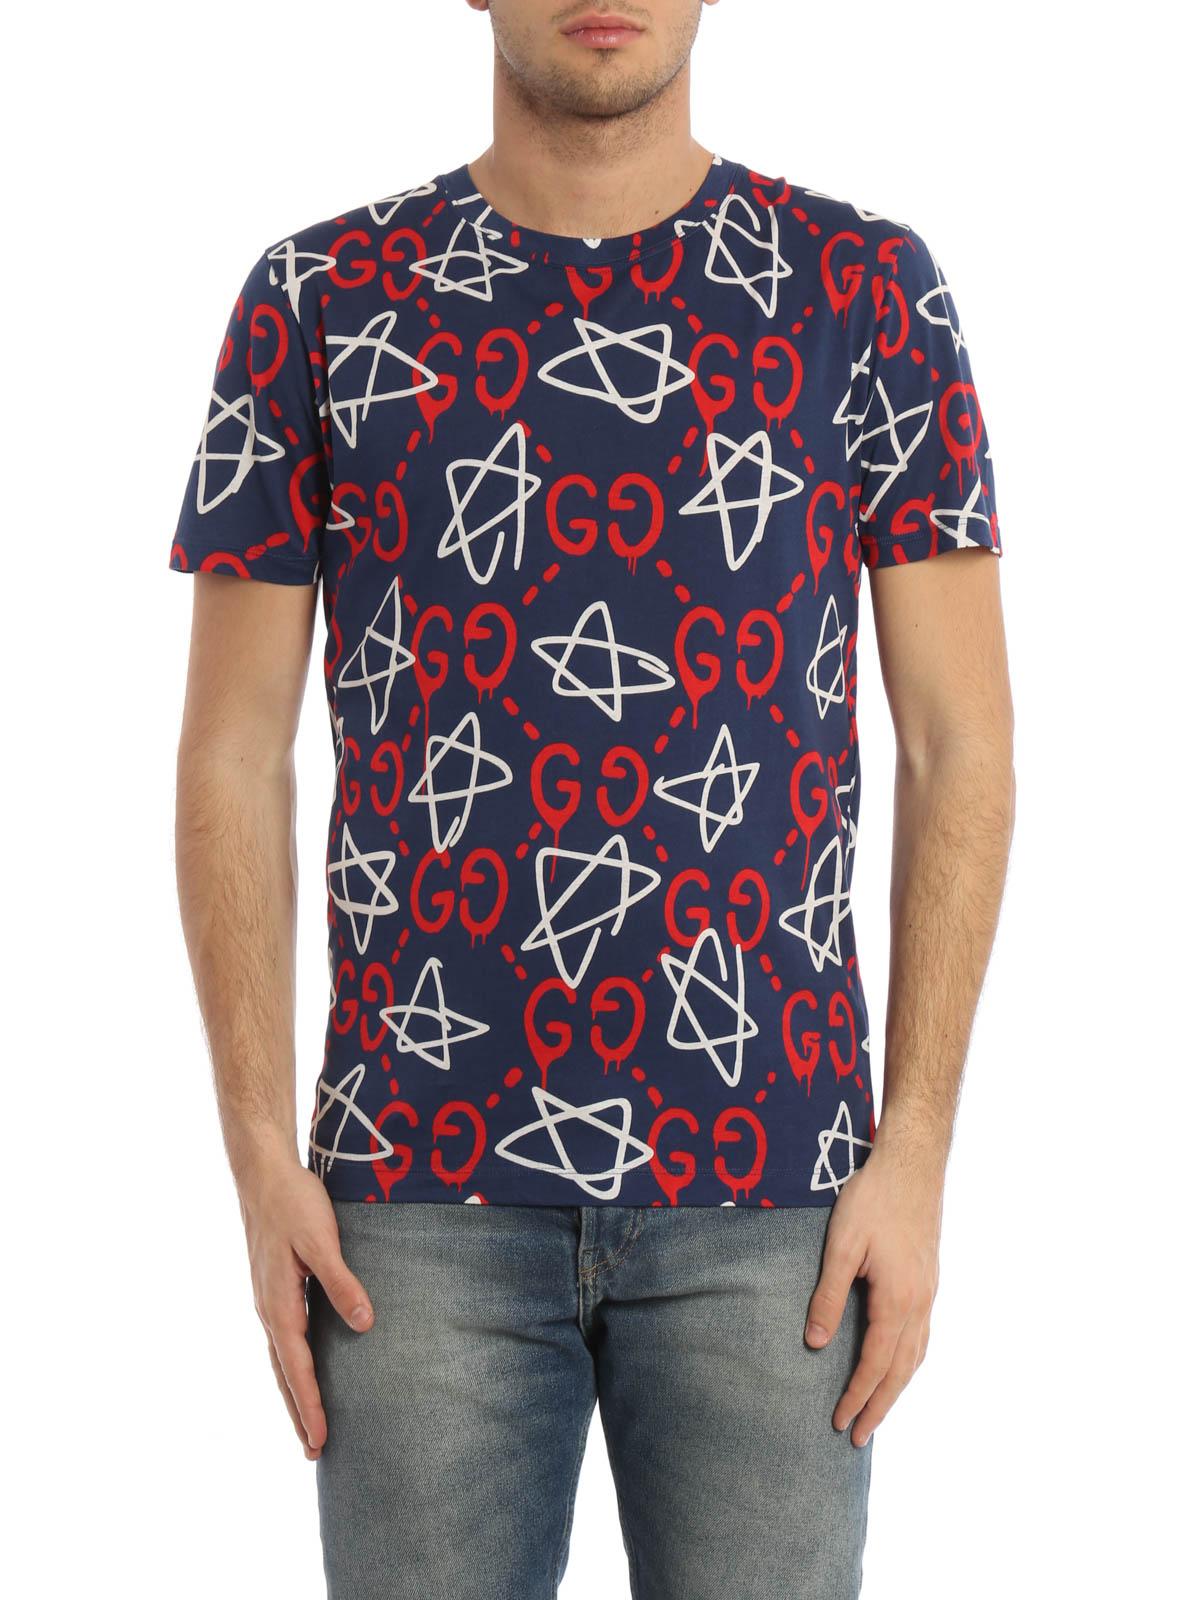 Gucci All Over Guccighost Print T Shirt T Shirts 457936 X3f26 4651